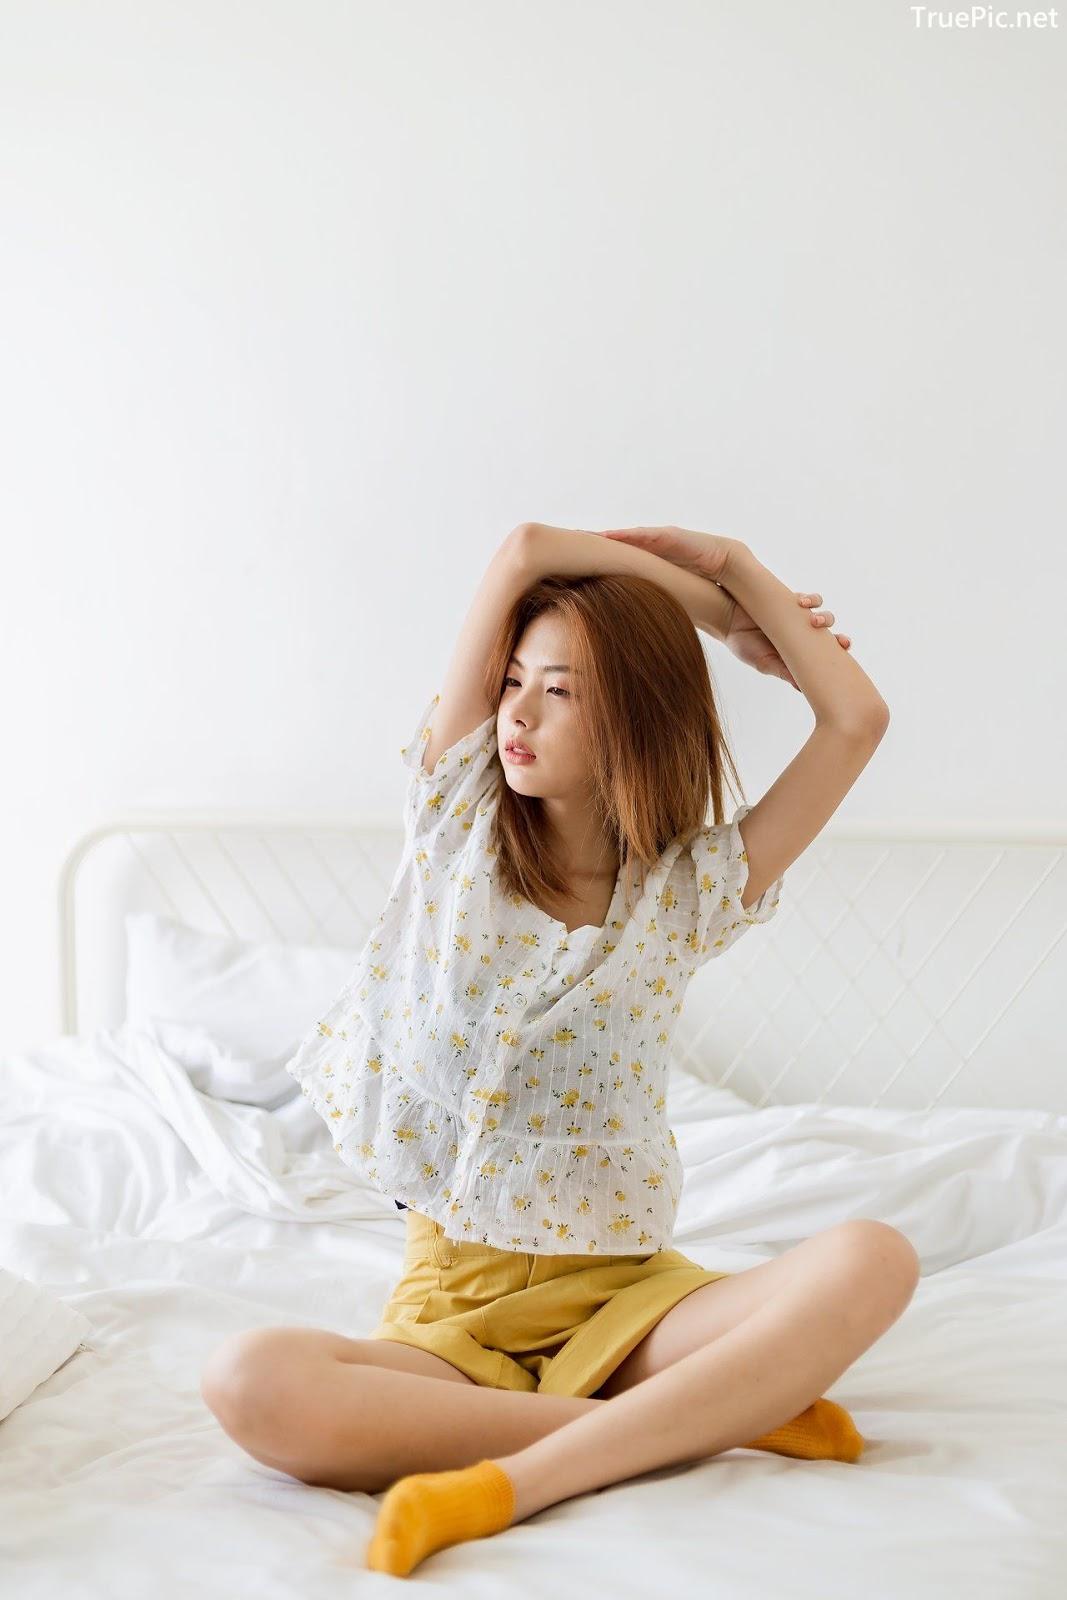 Image-Thailand-Angel-Model-Nut-Theerarat-White-Room-TruePic.net- Picture-3